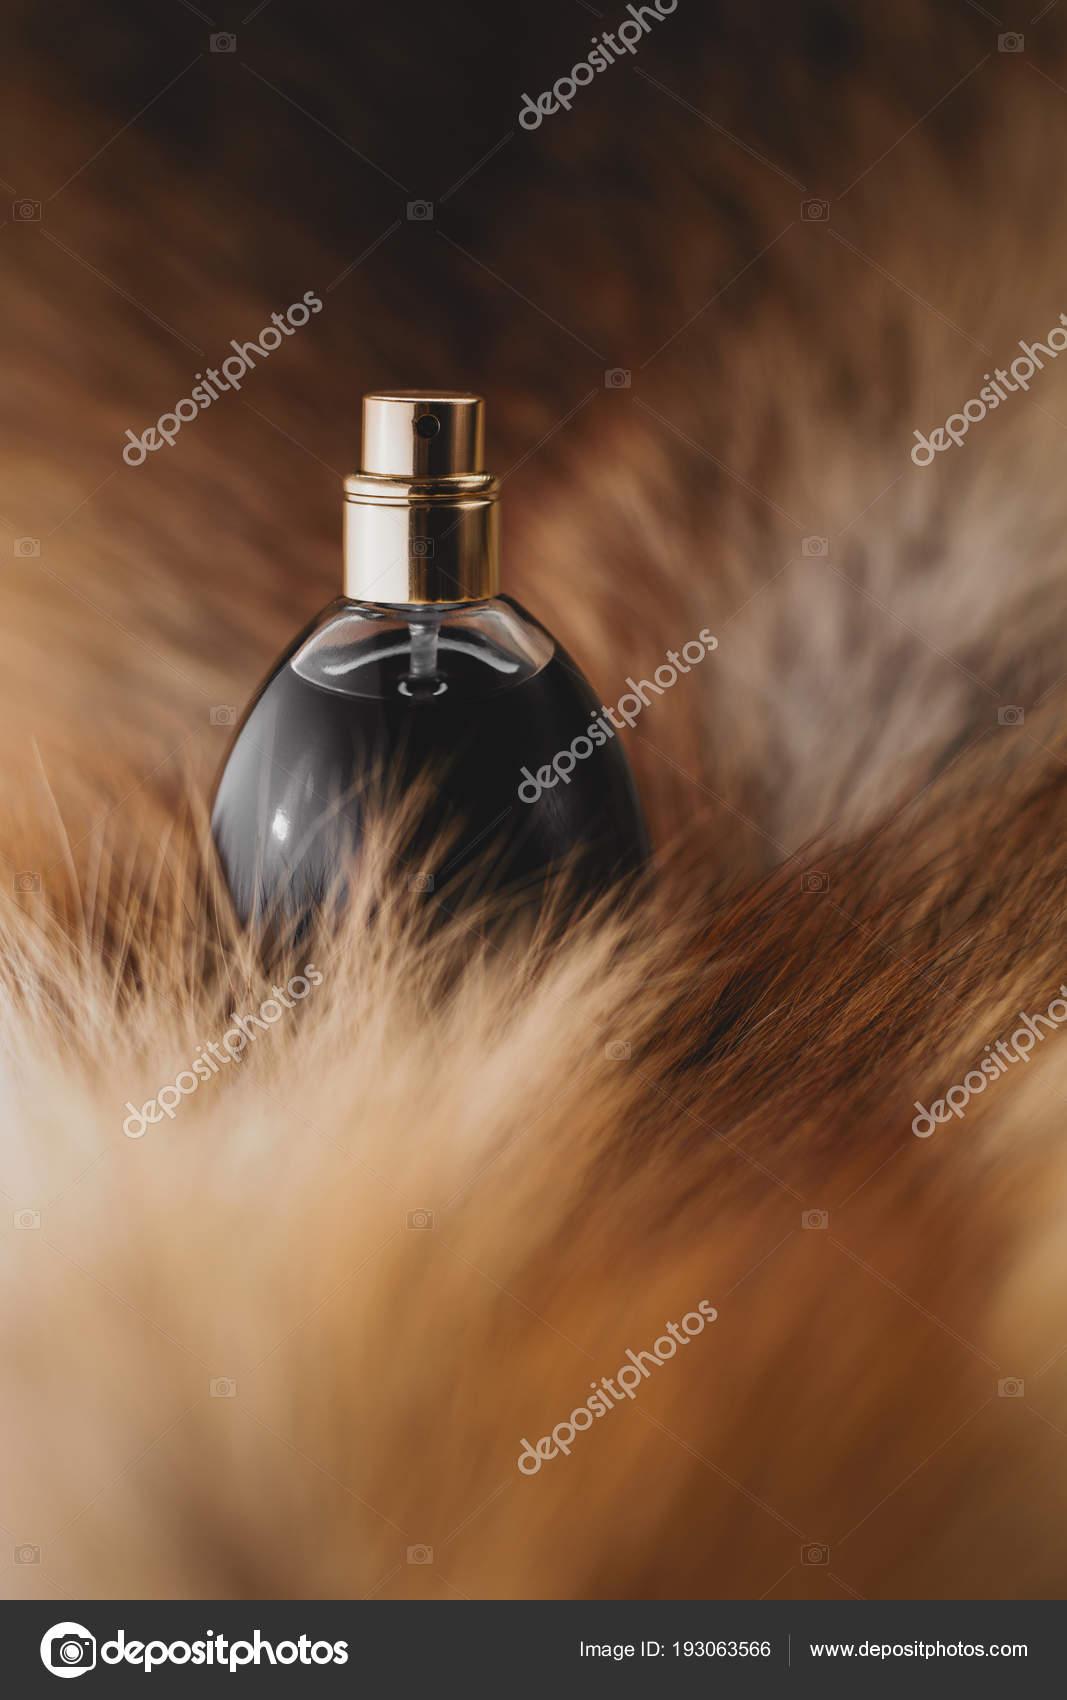 87e253b1973 Αρωματοποιία, καλλυντικά αρώματα — Φωτογραφία Αρχείου © Martyna1802 ...